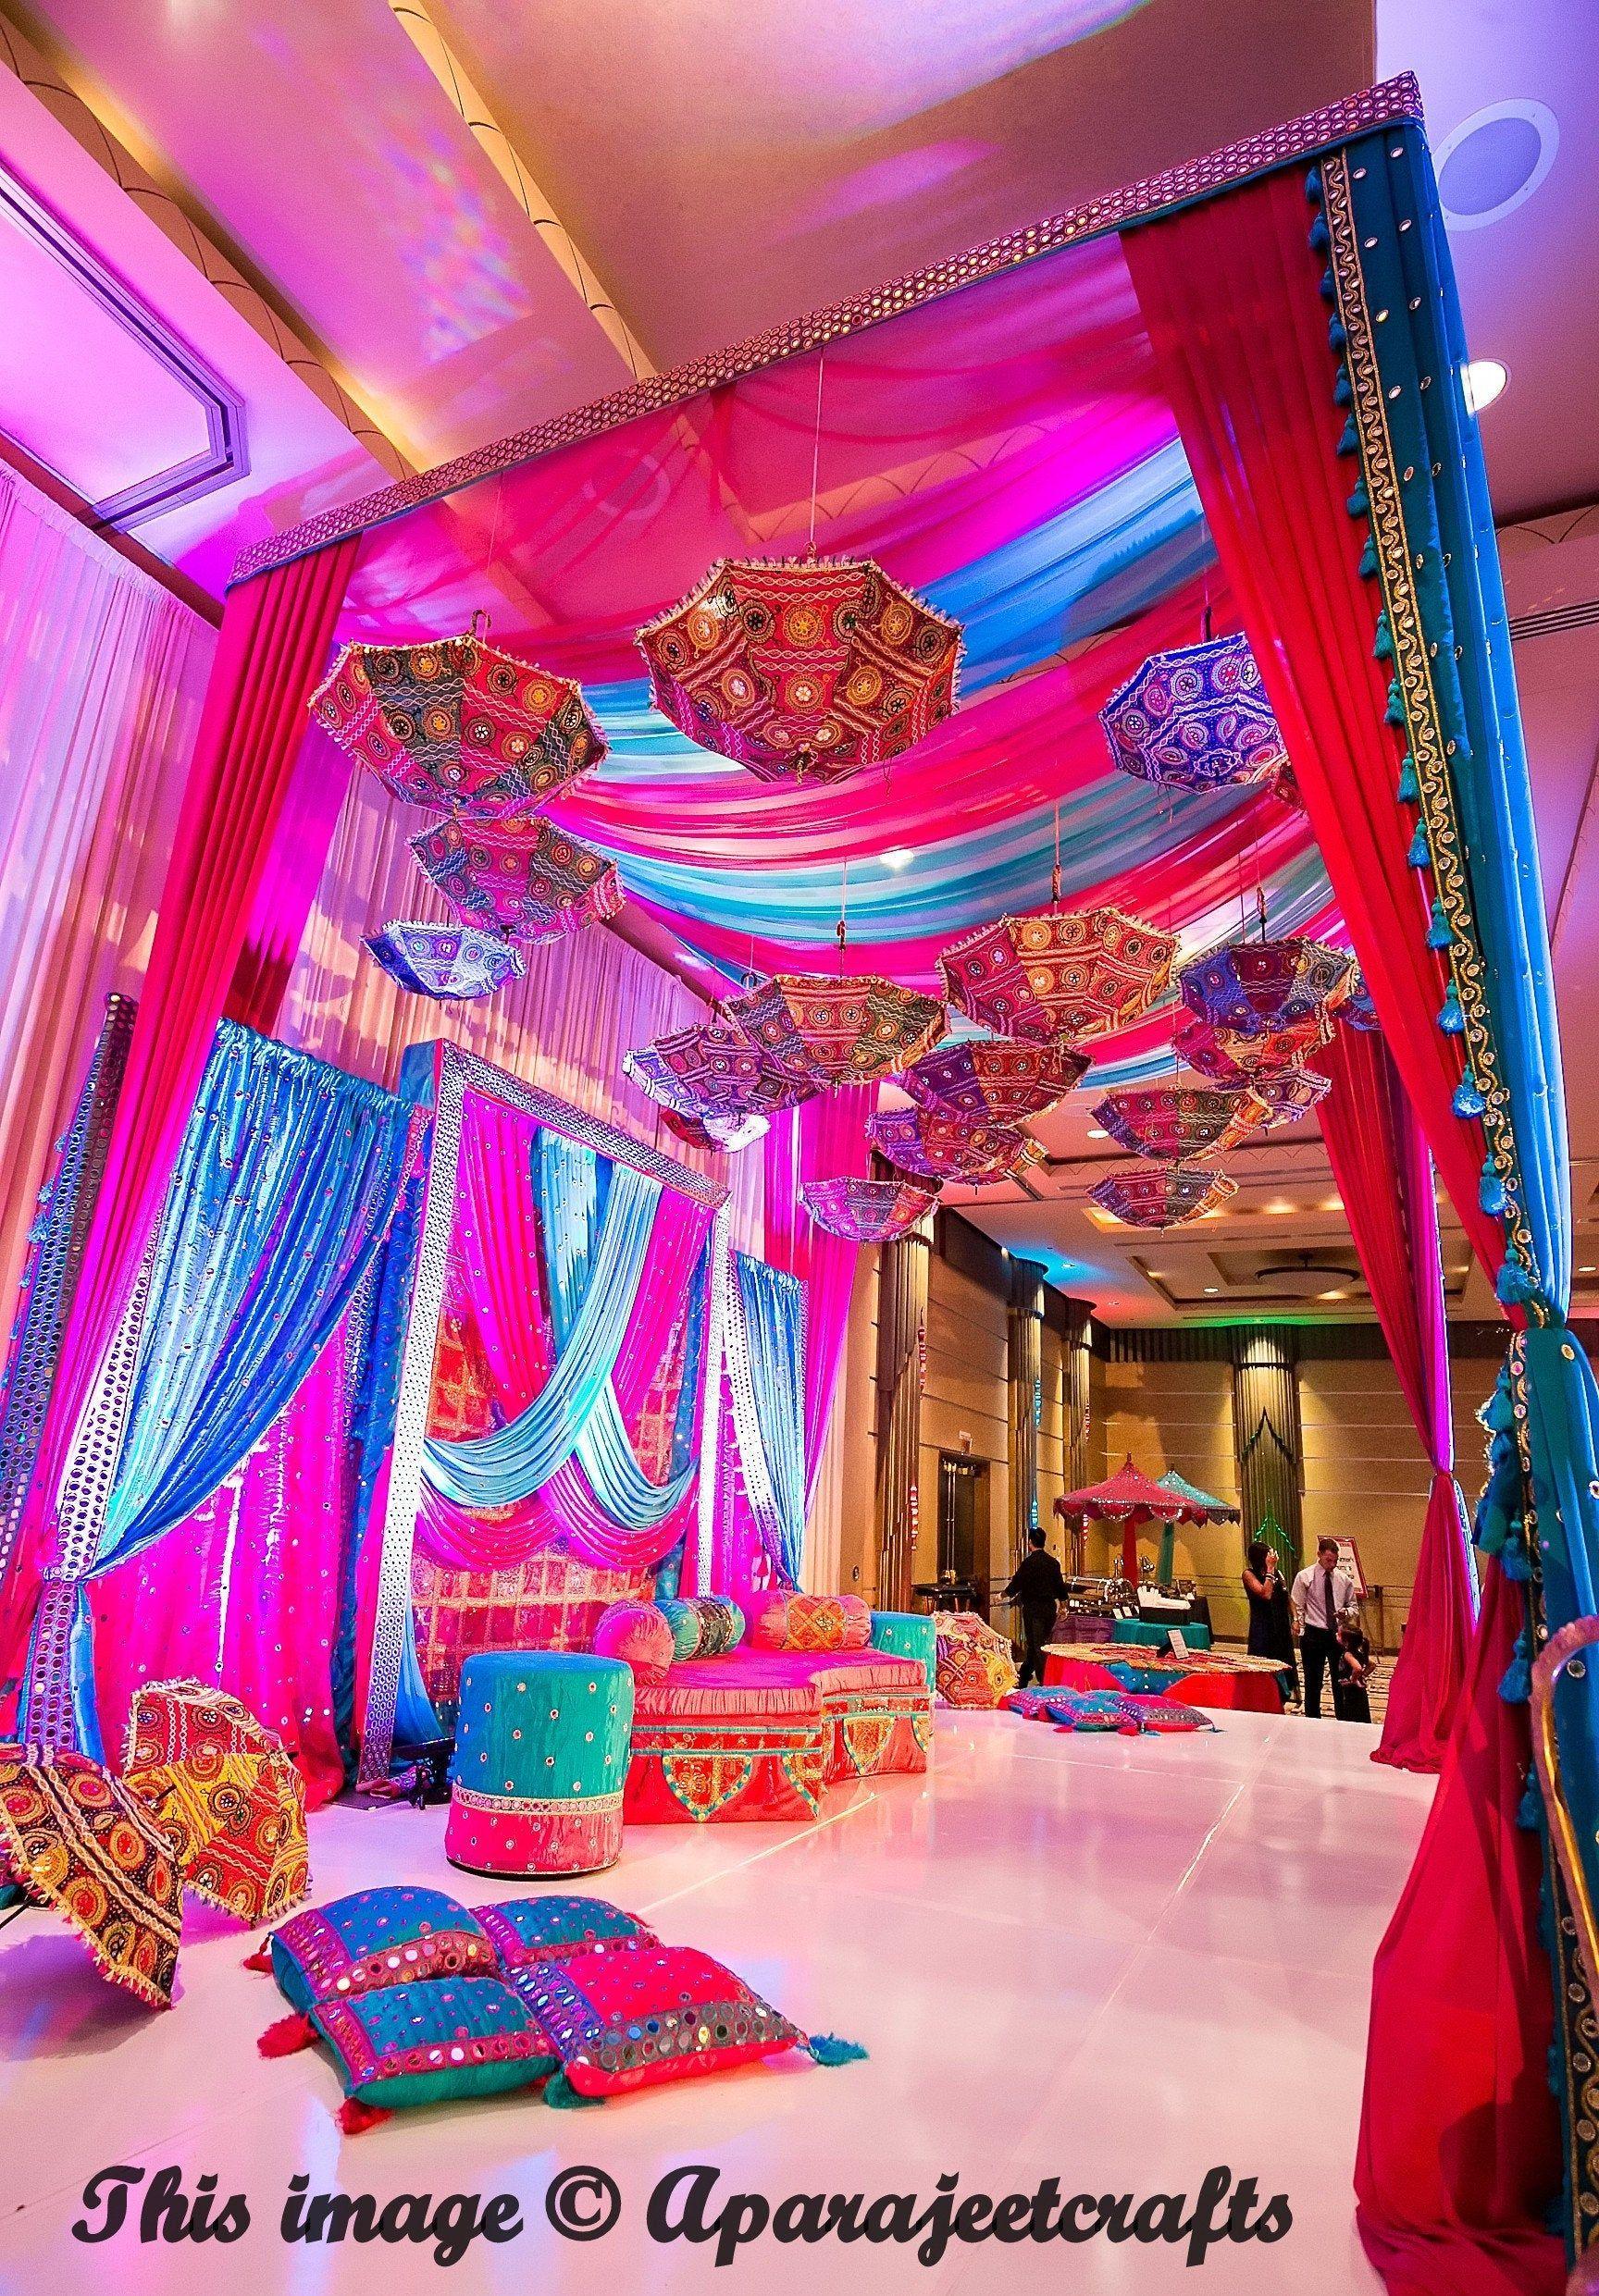 7 Pcs Lot Indian Wedding Umbrella Decoration Mirror Work Vintage